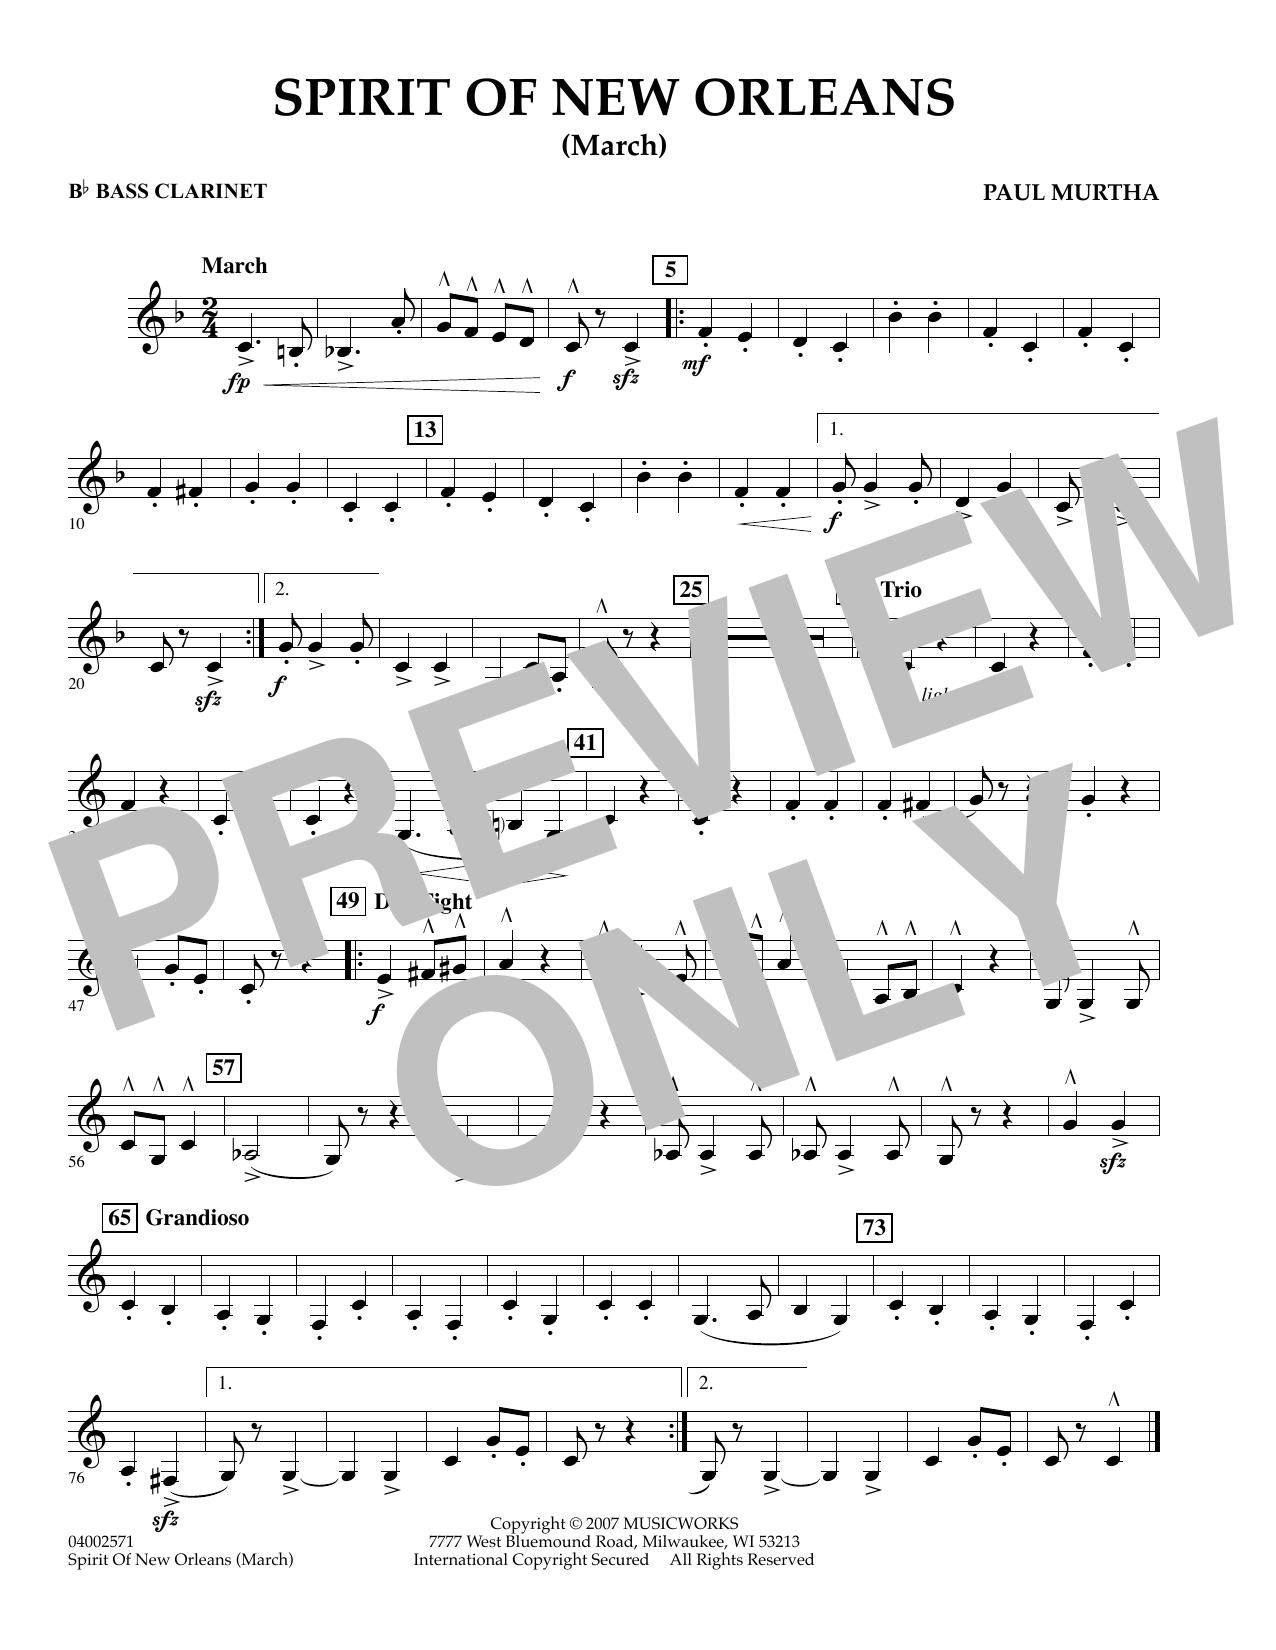 Spirit Of New Orleans (March) - Bb Bass Clarinet sheet music